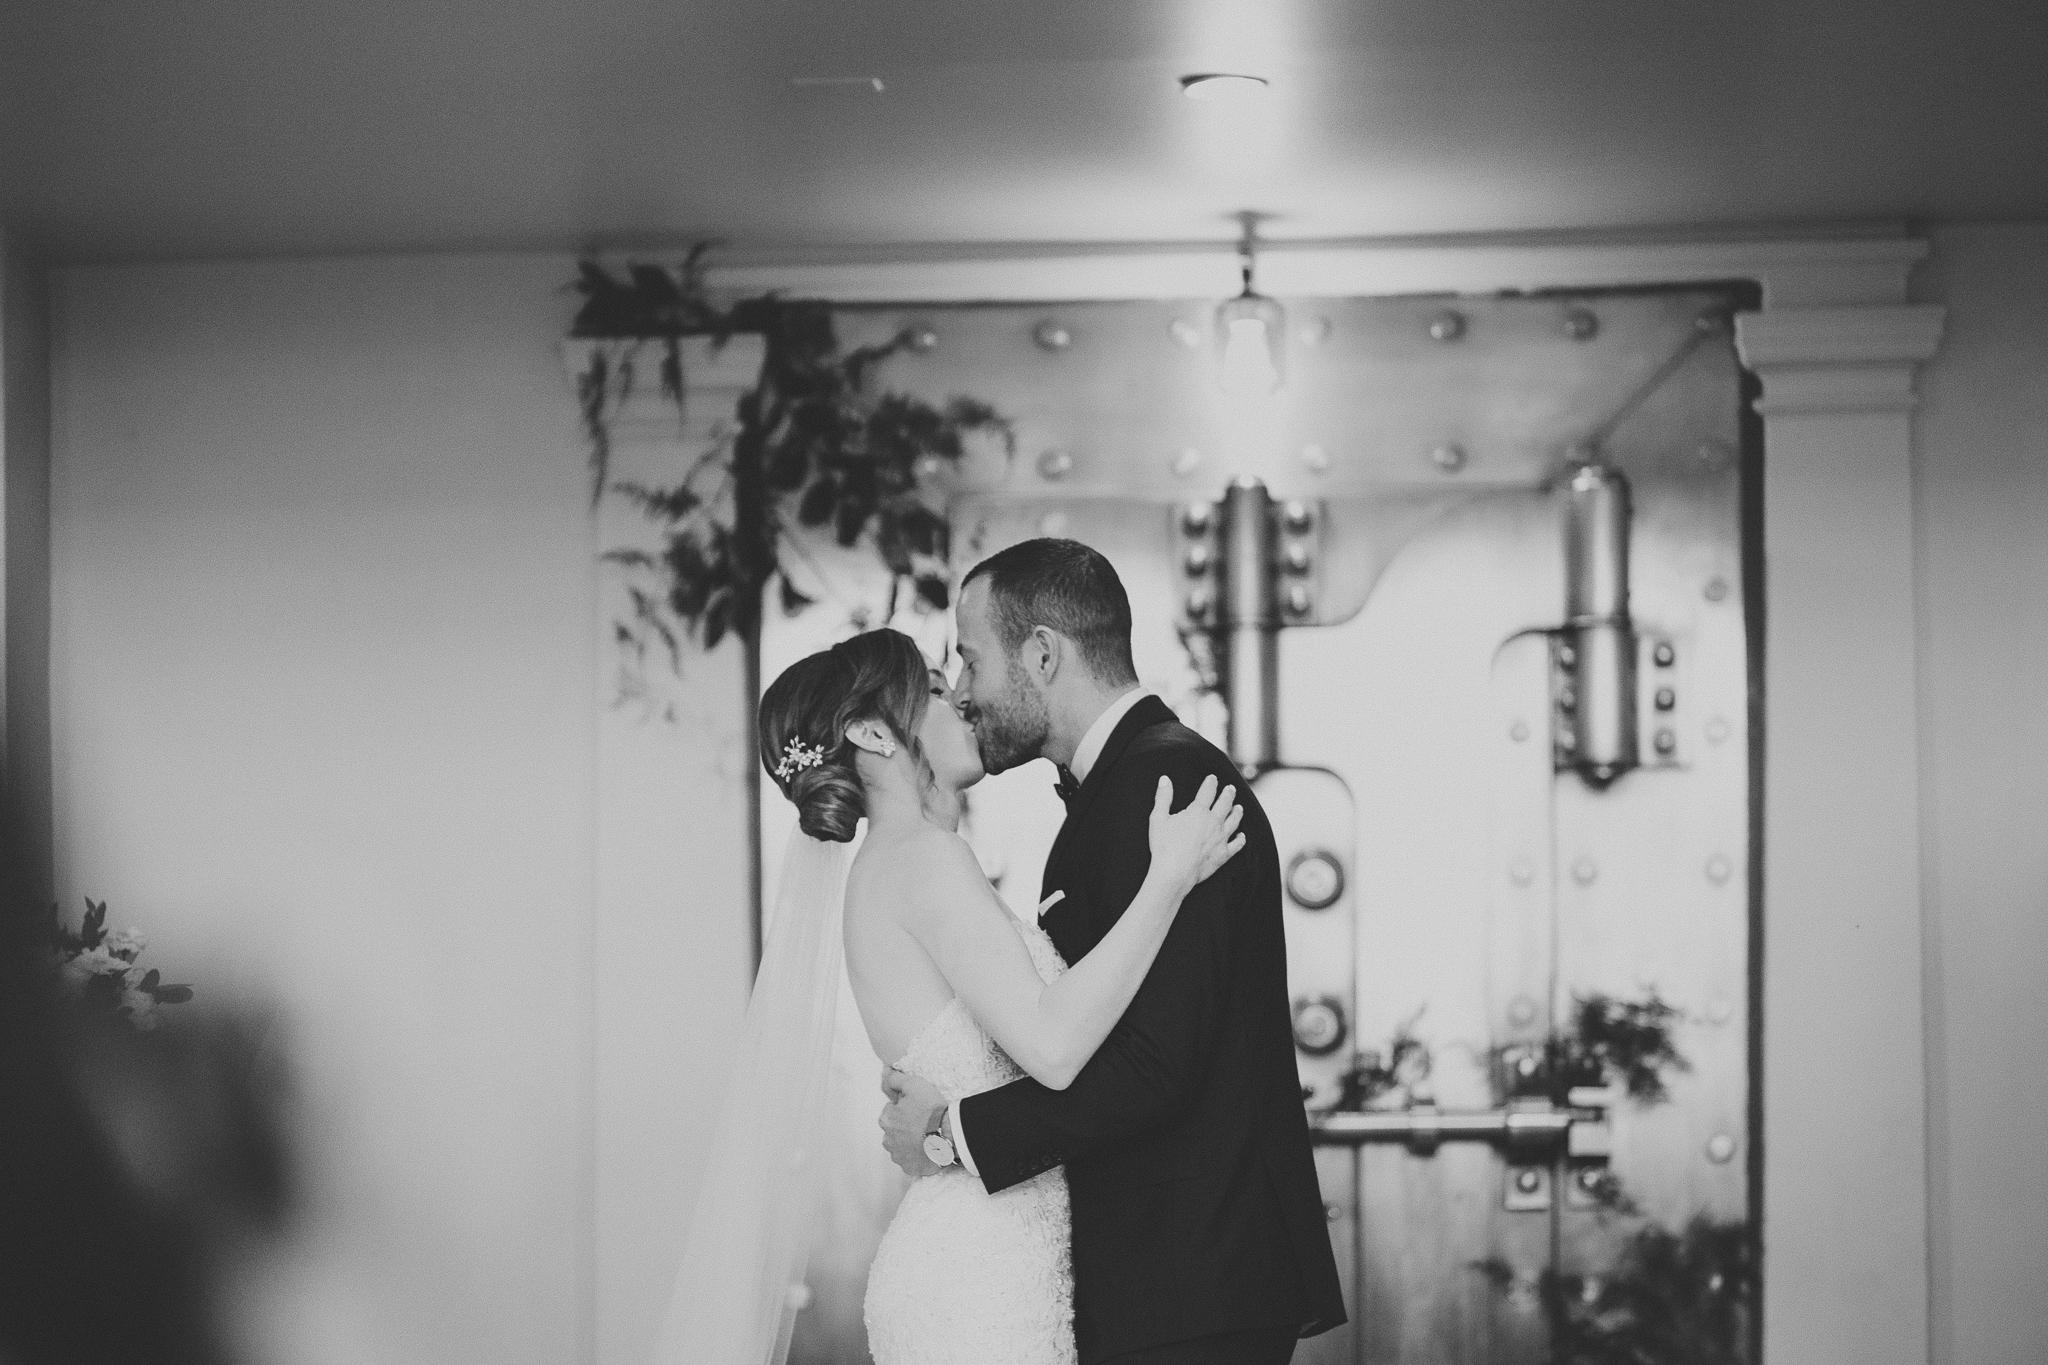 188-permanent-vancouver-wedding-courtneysteven-web-0316.jpg